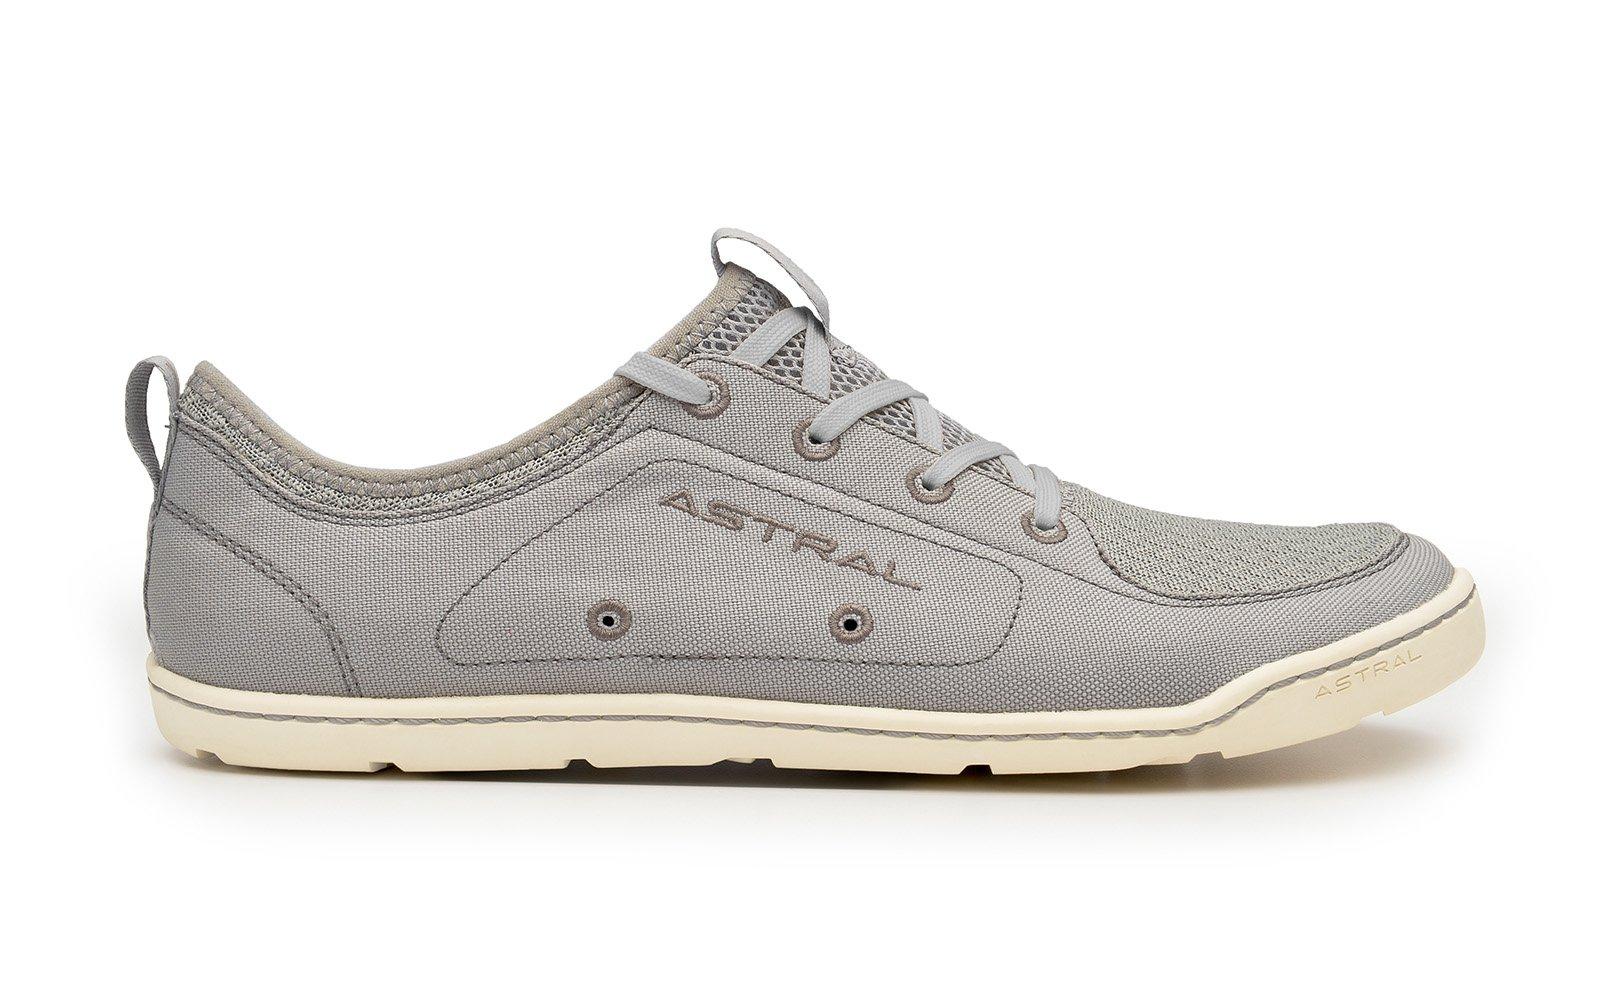 Astral Loyak Women's Water Shoe - Gray/White - W8